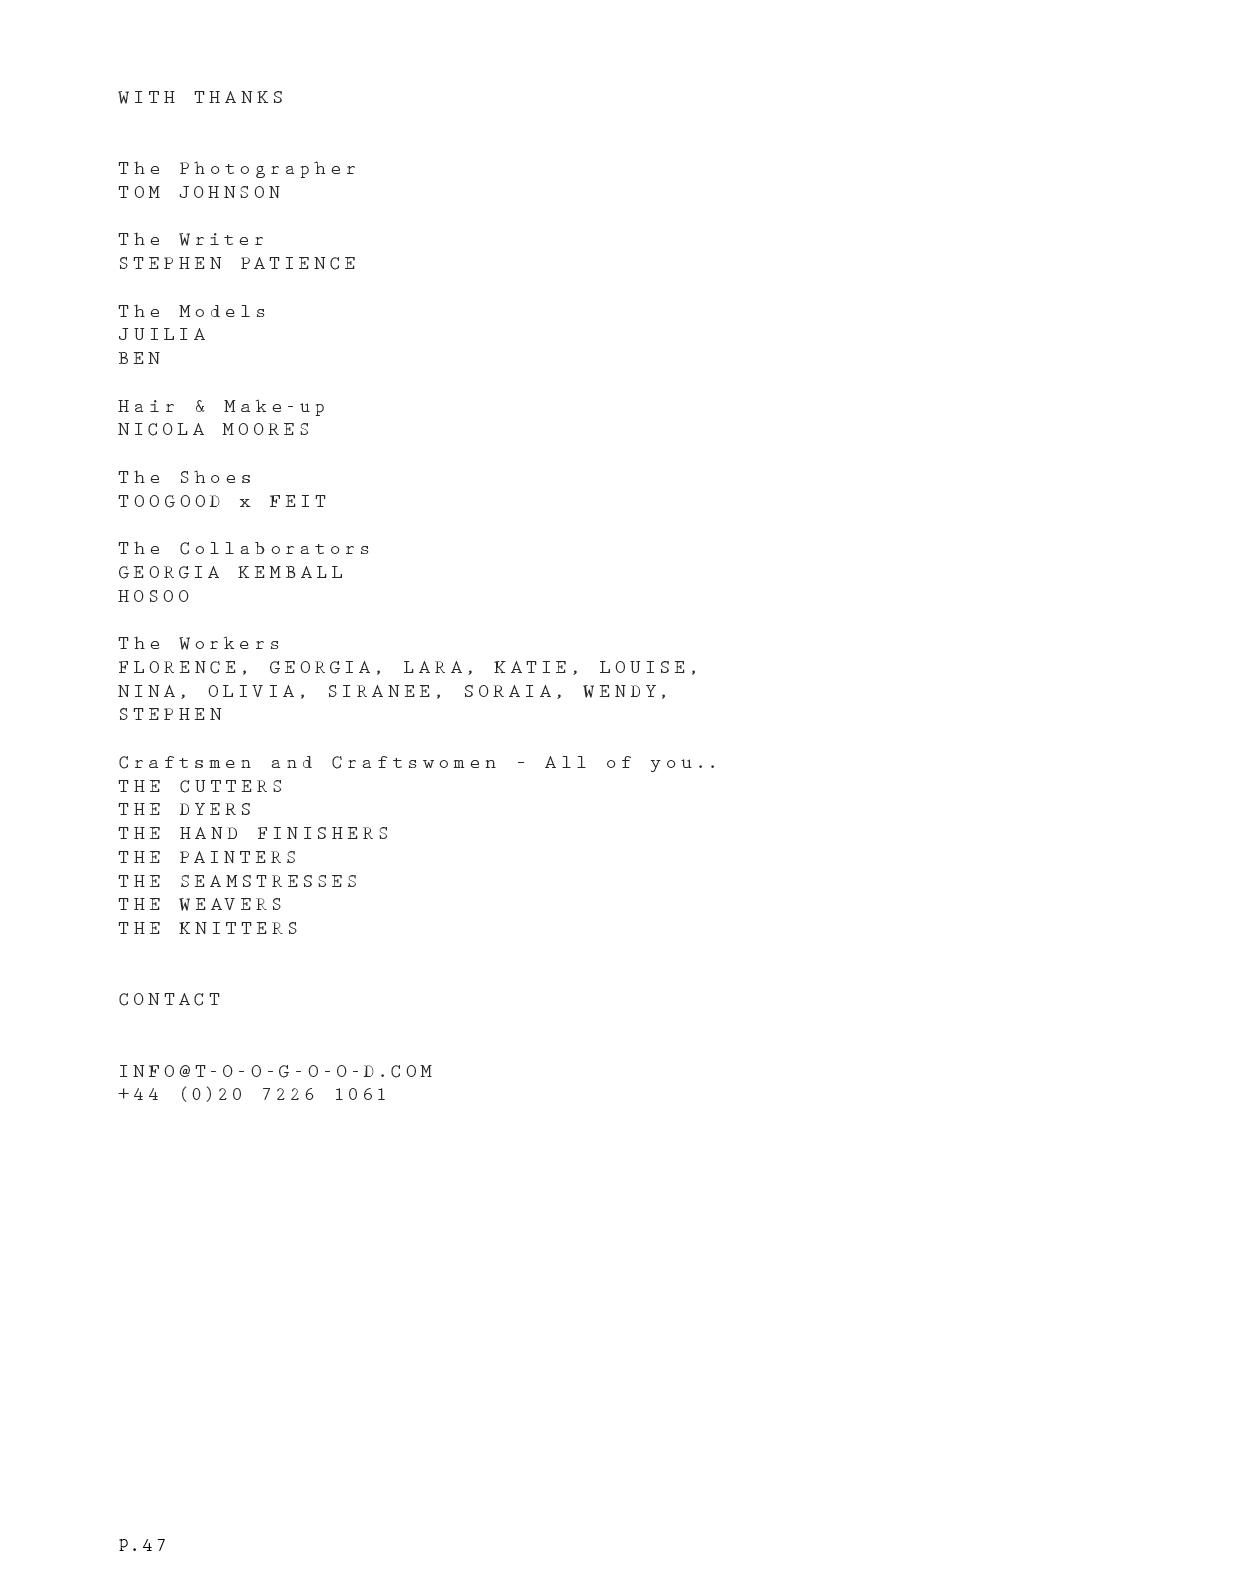 007_Toogood_Collection_Book_DIGITAL_LoRES47.jpg